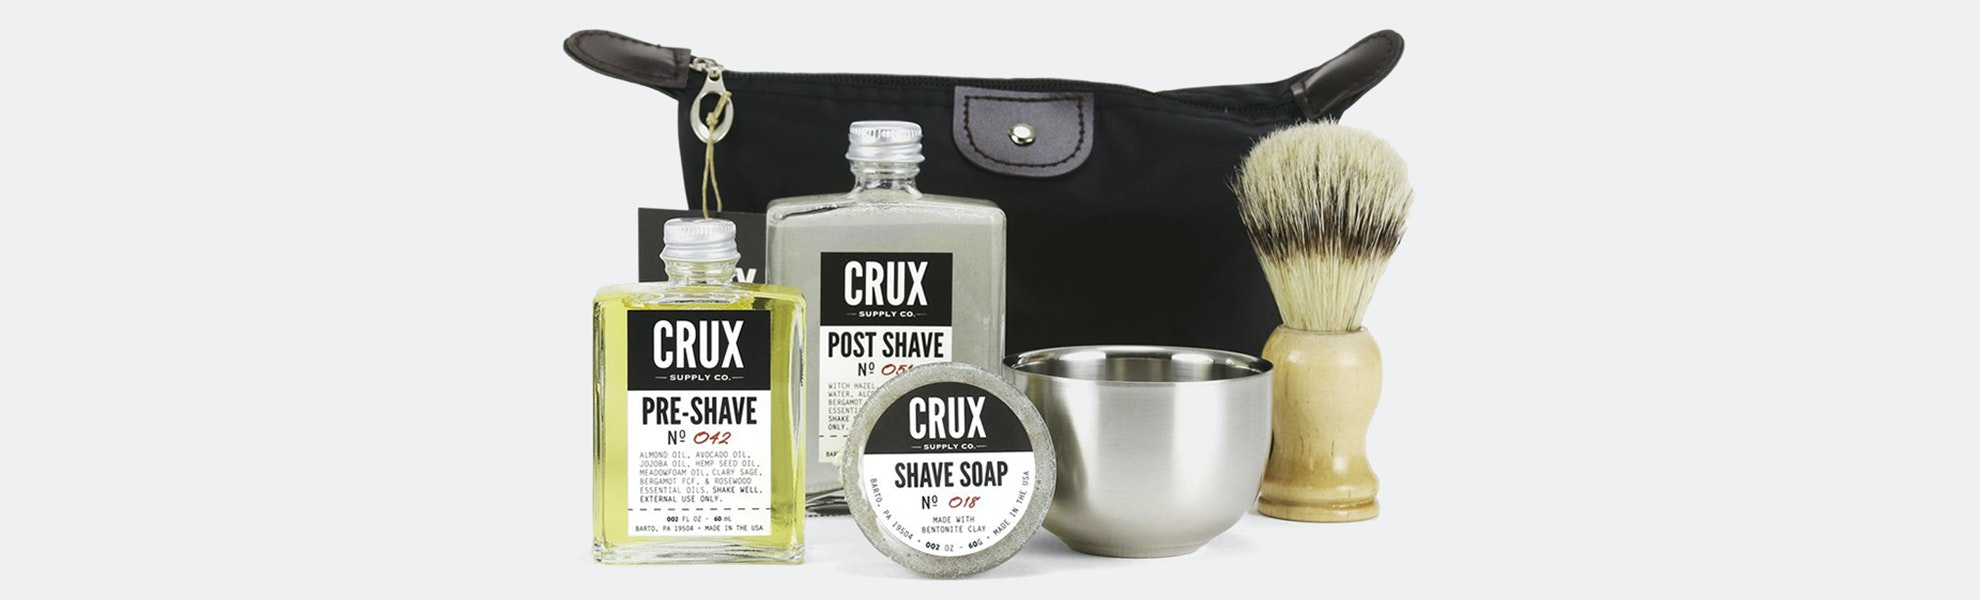 Crux Supply Co. Deluxe Shaving Kit